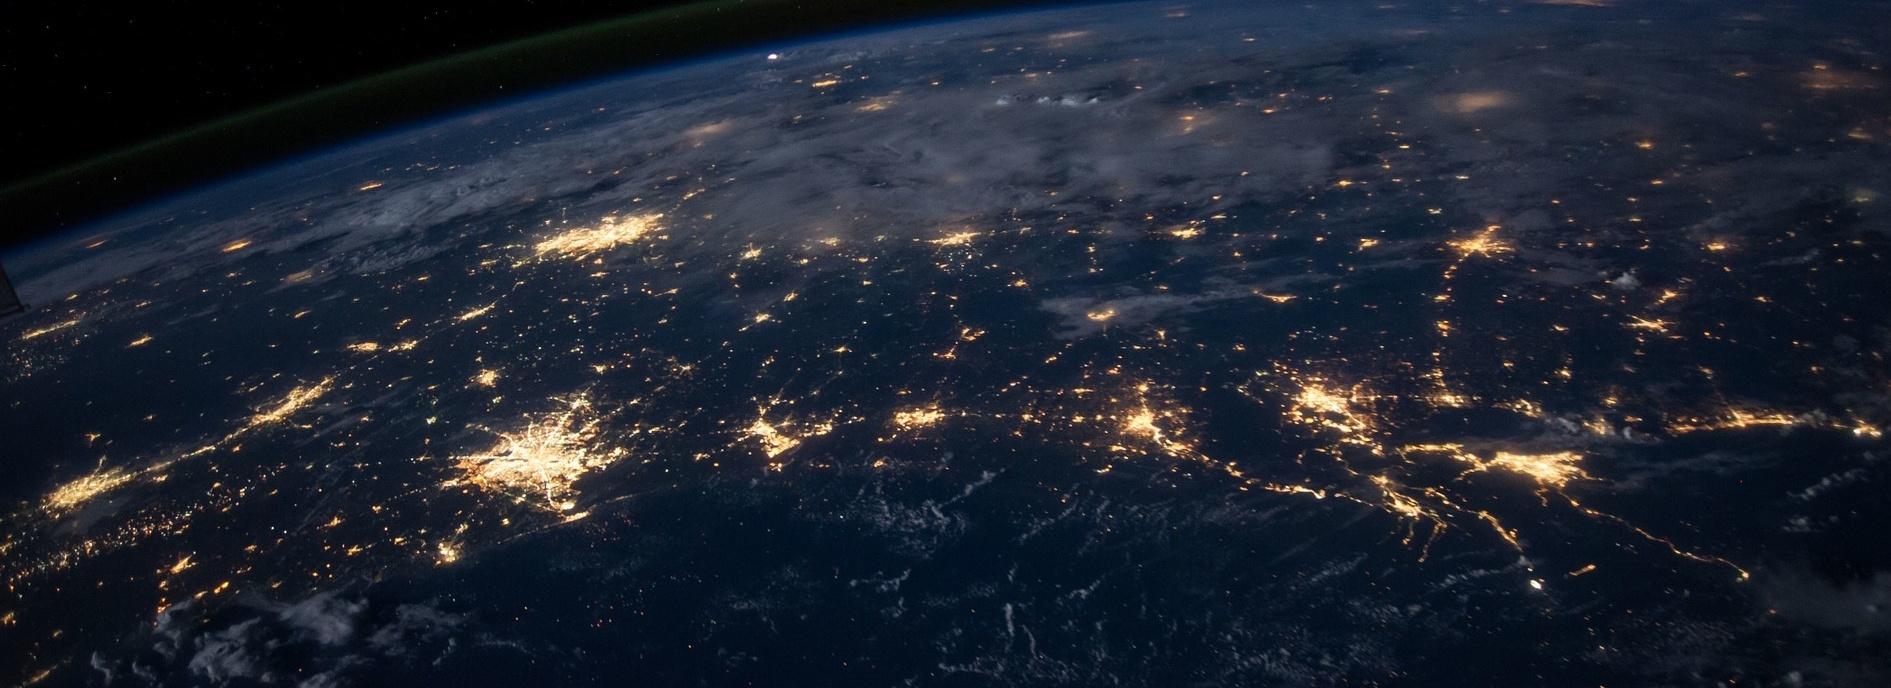 ferc-reliability-lights-night-nasa-509375-edited.jpg